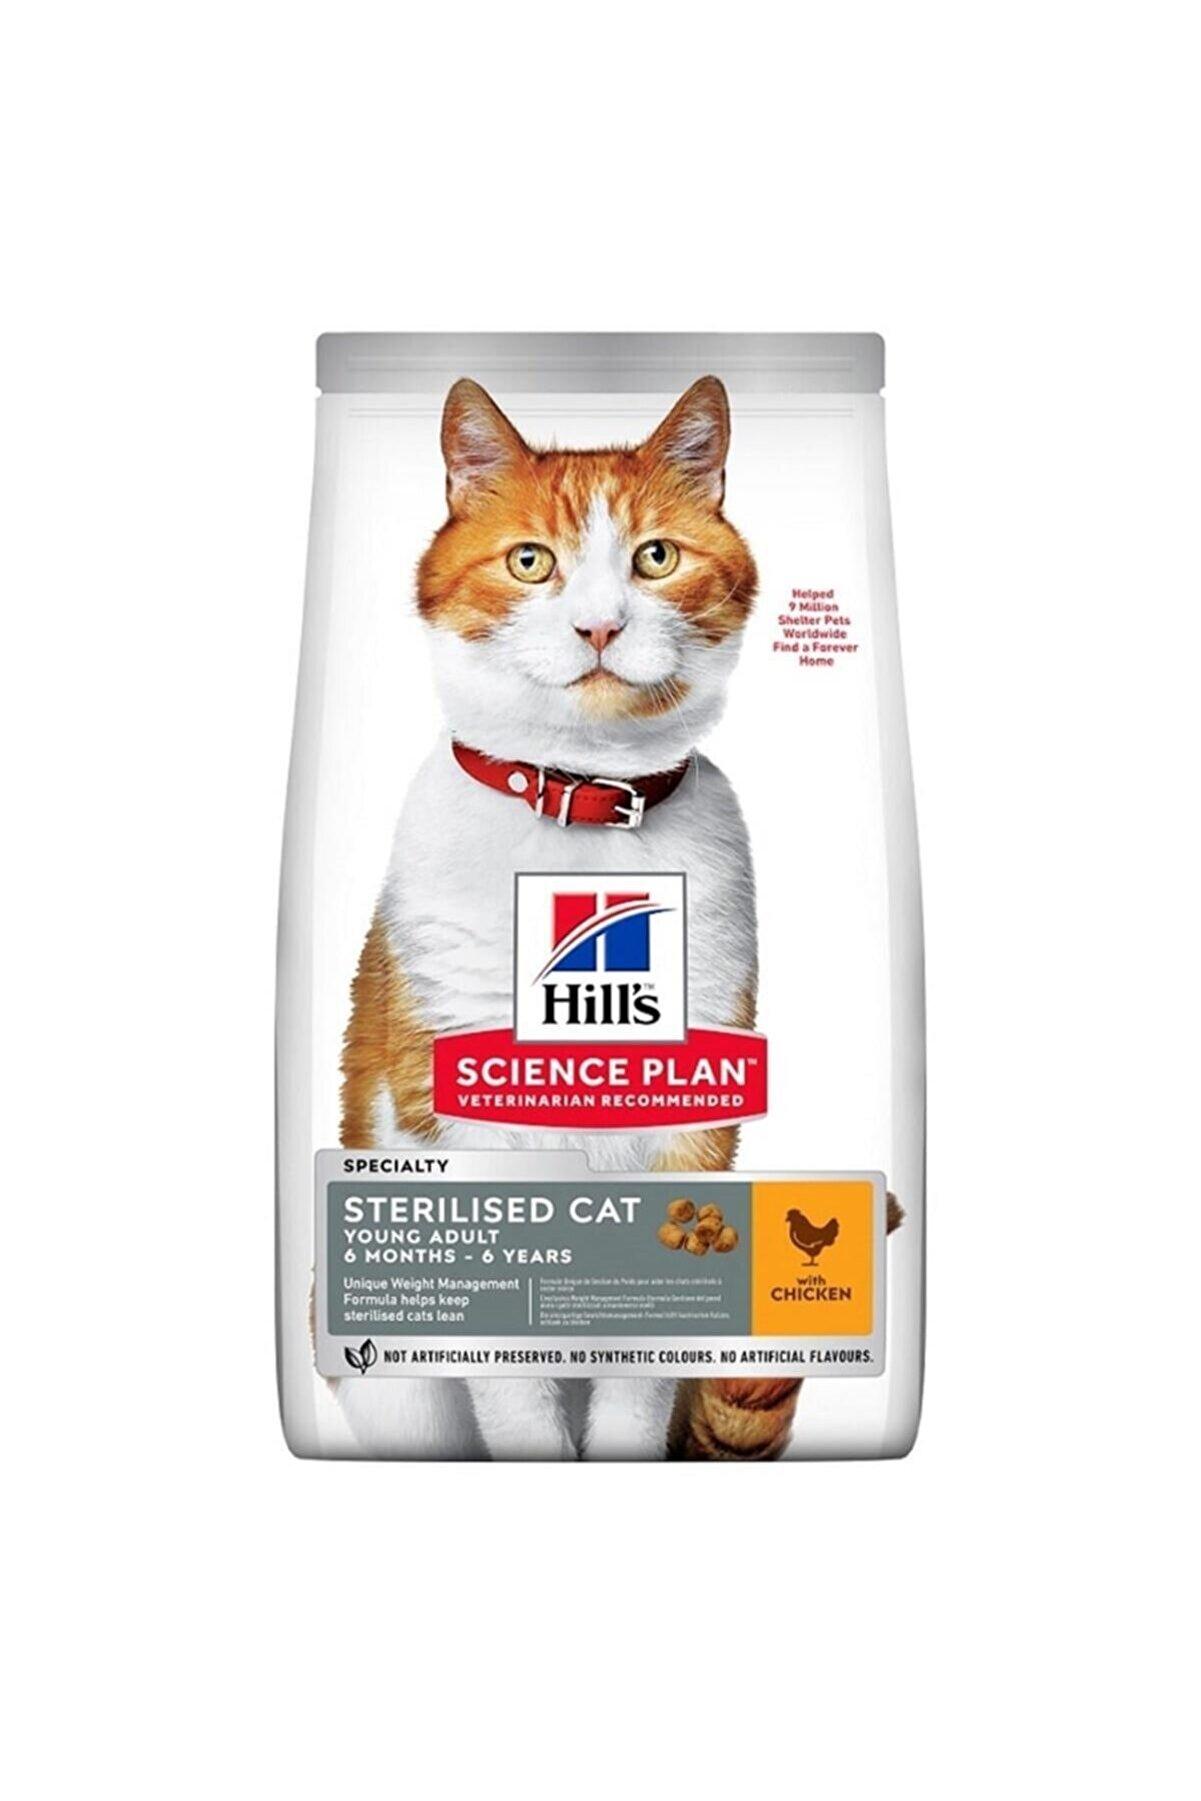 Hills Science Plan Hills Adult Tavuklu Kısırlaştırılmış Yetişkin Kedi Maması 3 Kg